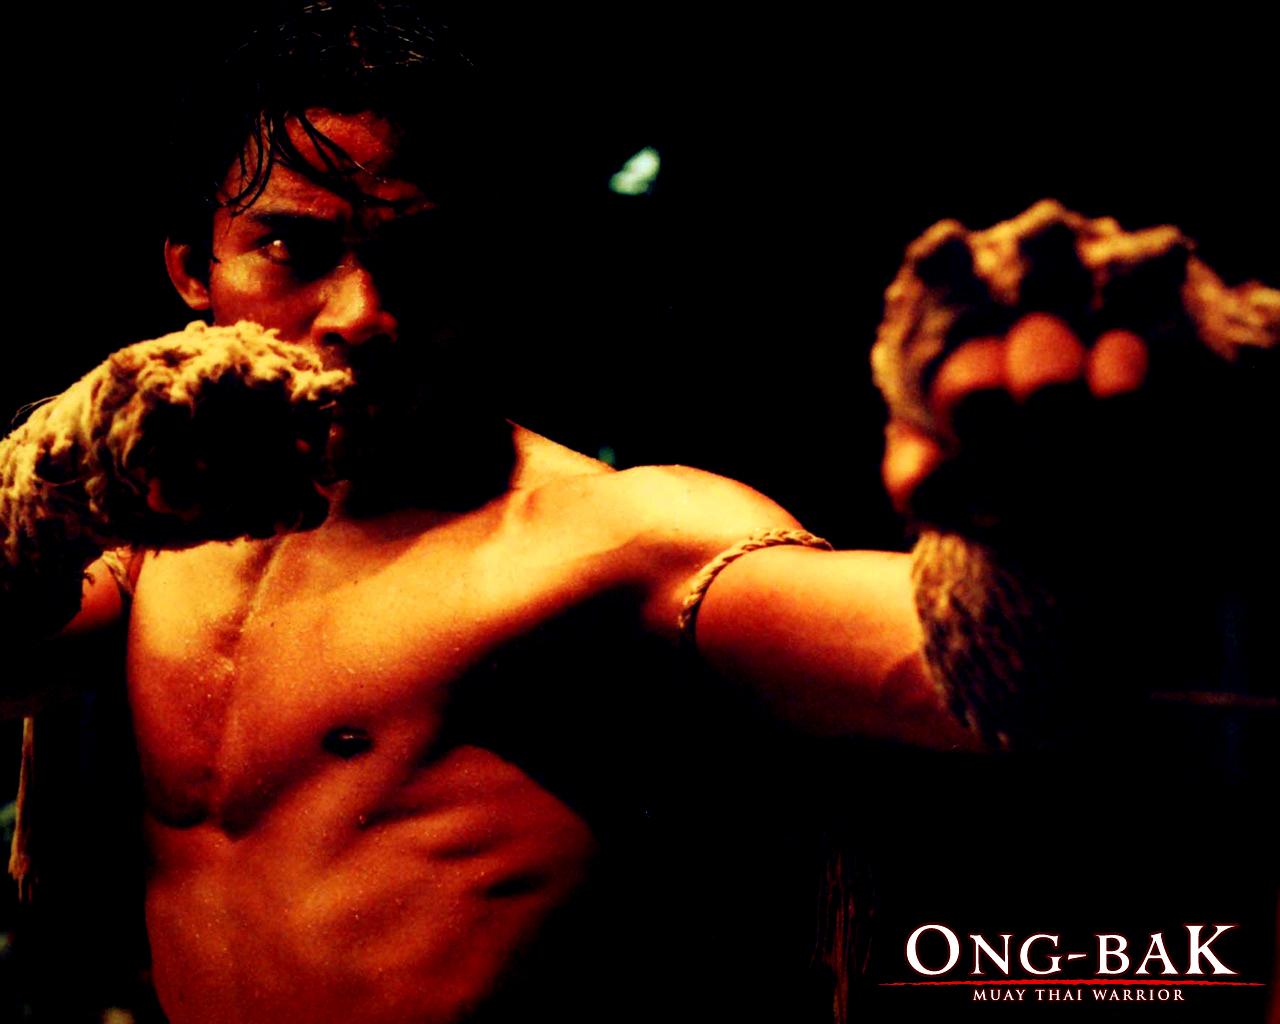 http://2.bp.blogspot.com/_QahWUGV6wMI/TTfWcDaFOLI/AAAAAAAAAP8/1FYSAKsnmoY/s1600/2.jpg